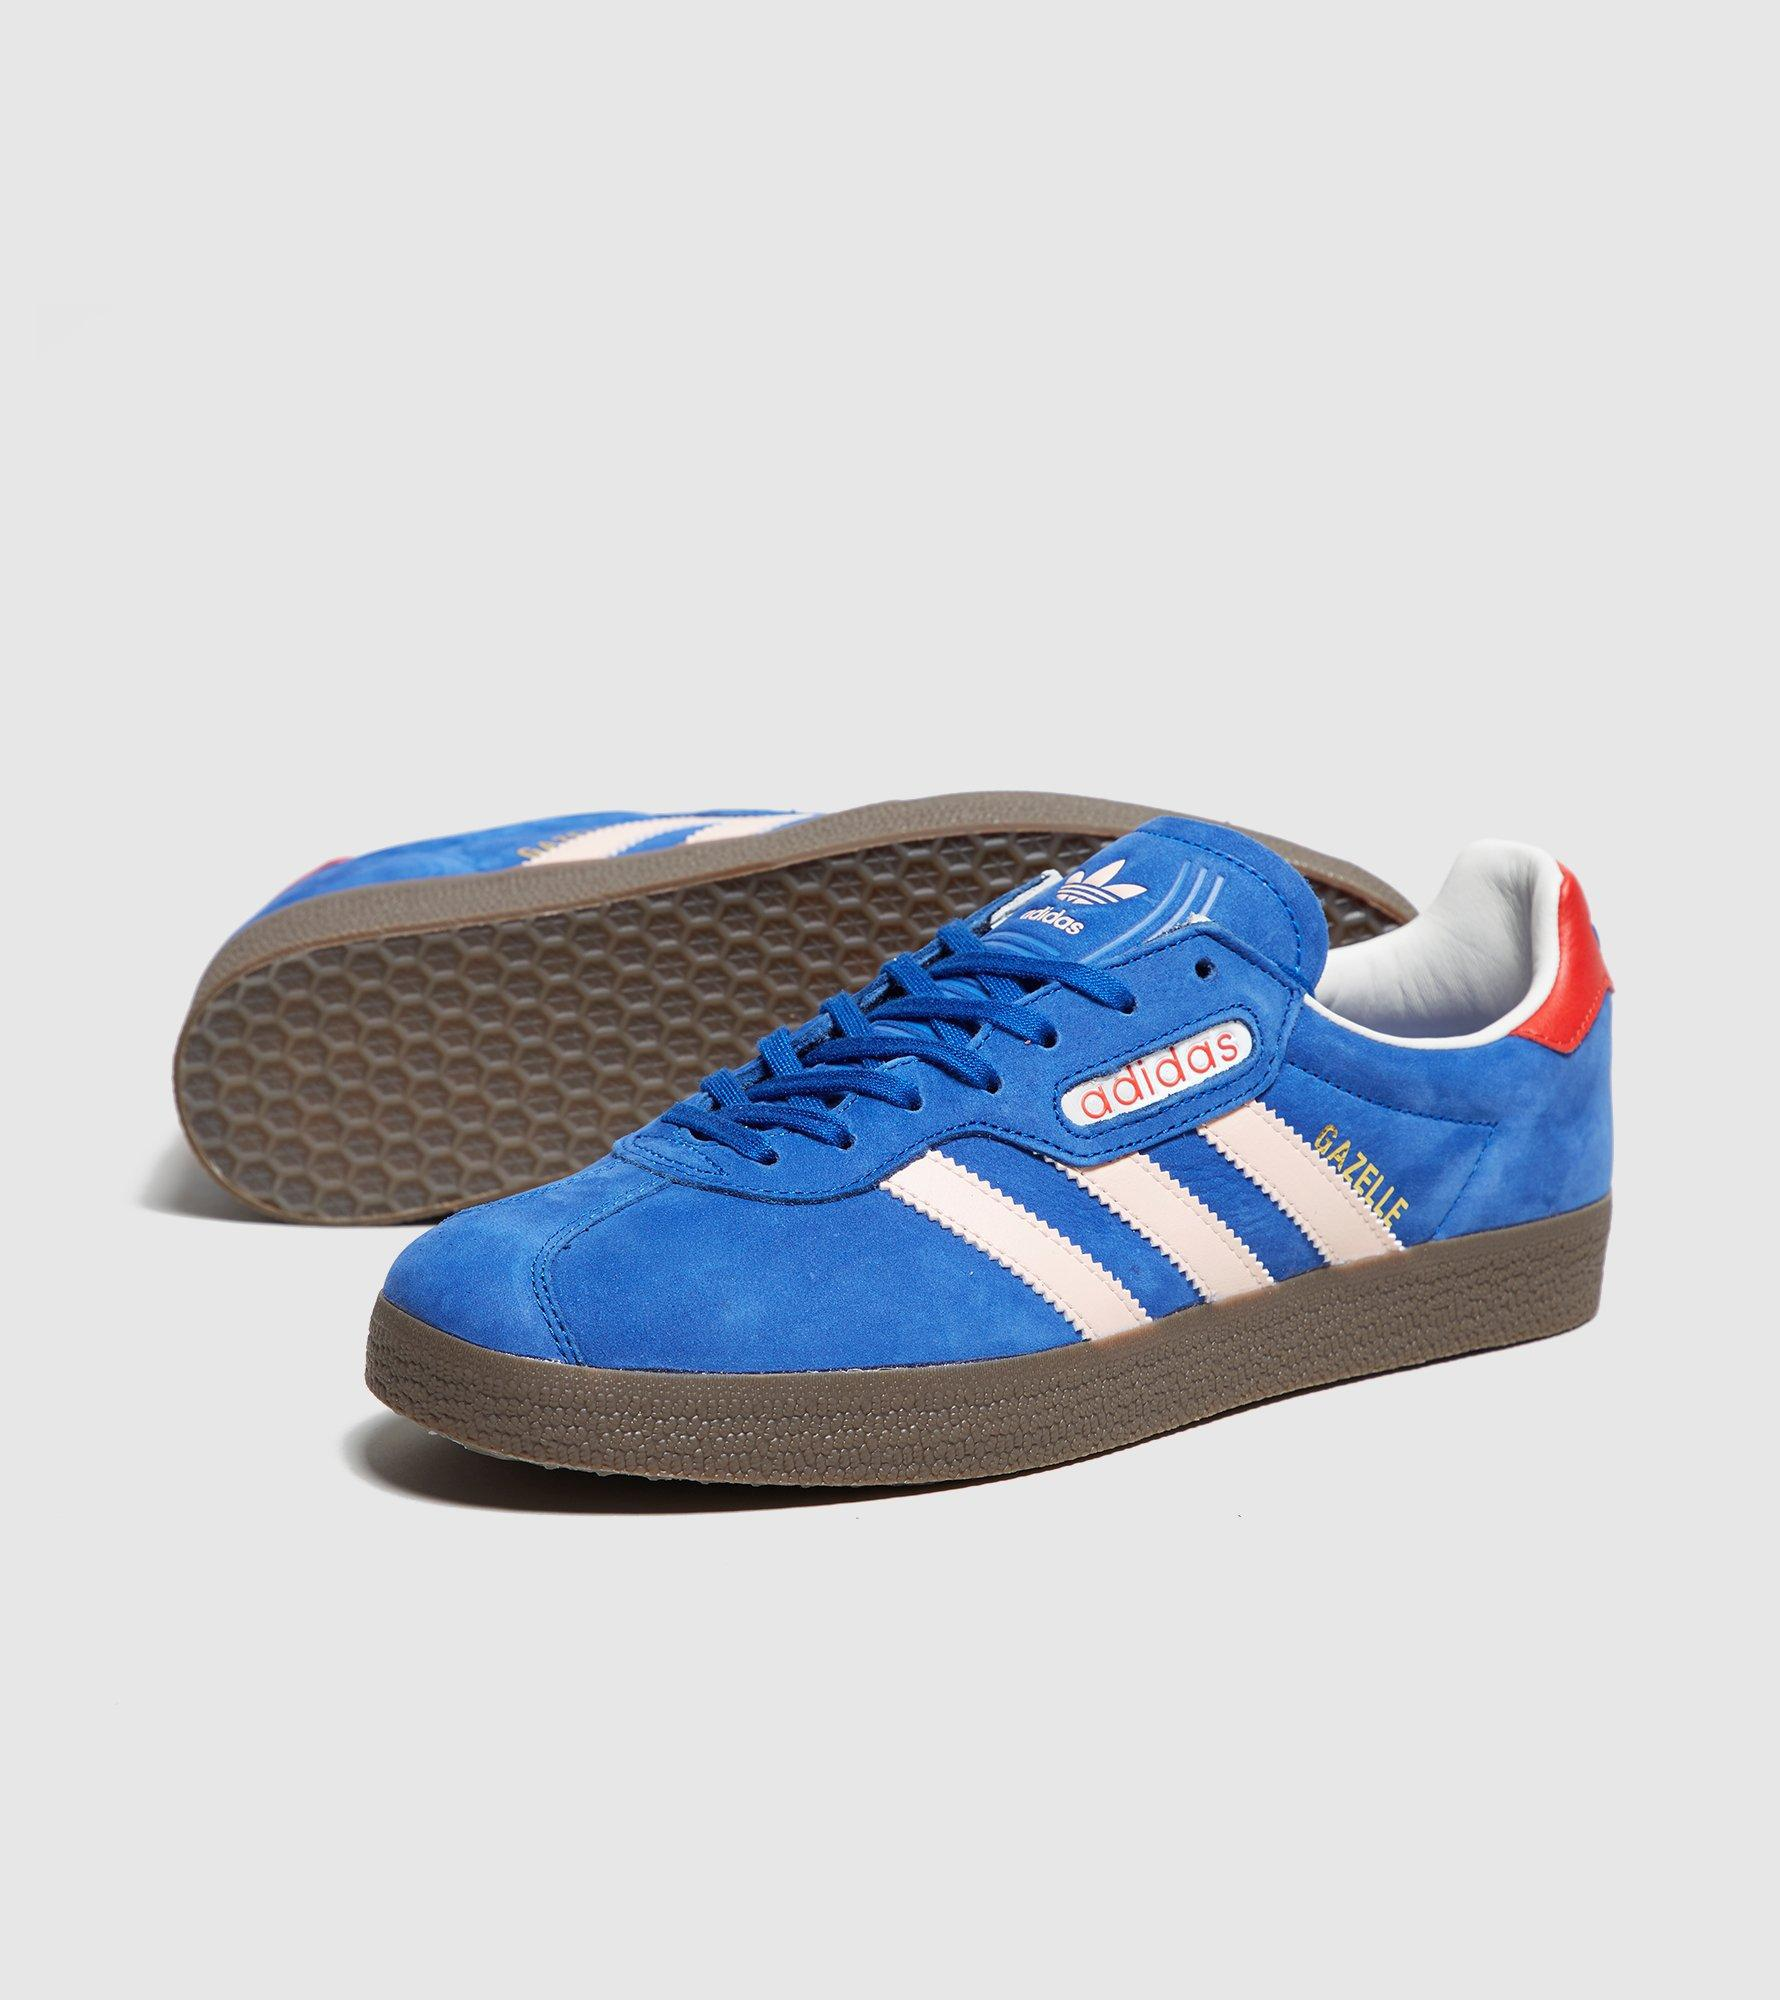 Gazelle Lyst Size naar Originals Manchester Super Adidas London qSOrSwFX4